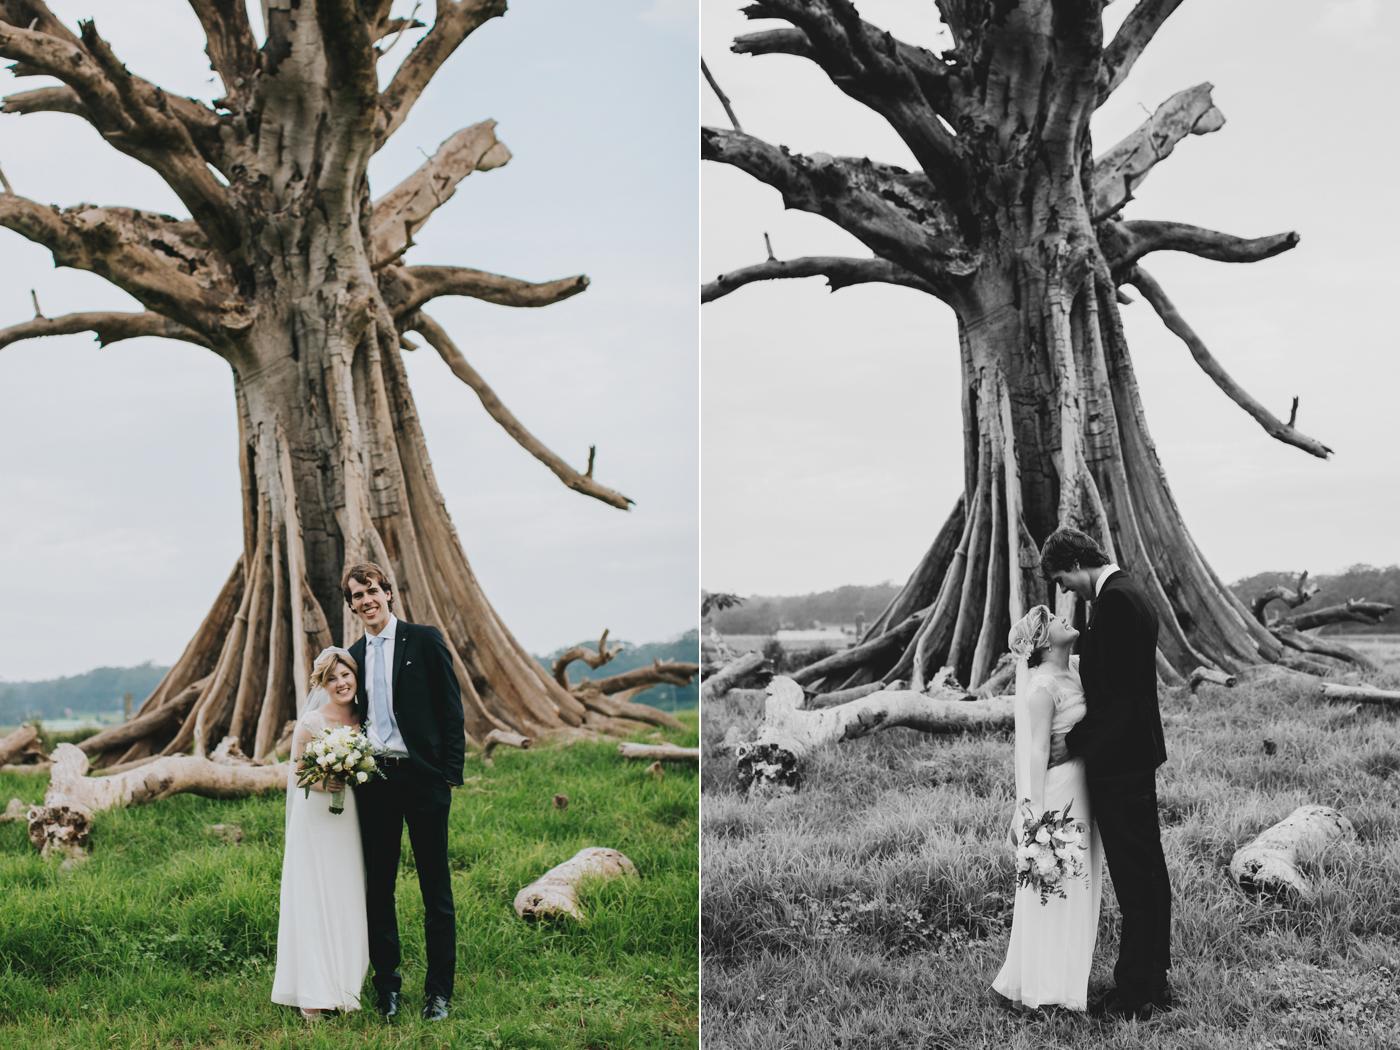 Rachel & Jacob - Willow Farm Berry - South Coast Wedding - Samantha Heather Photography-107.jpg